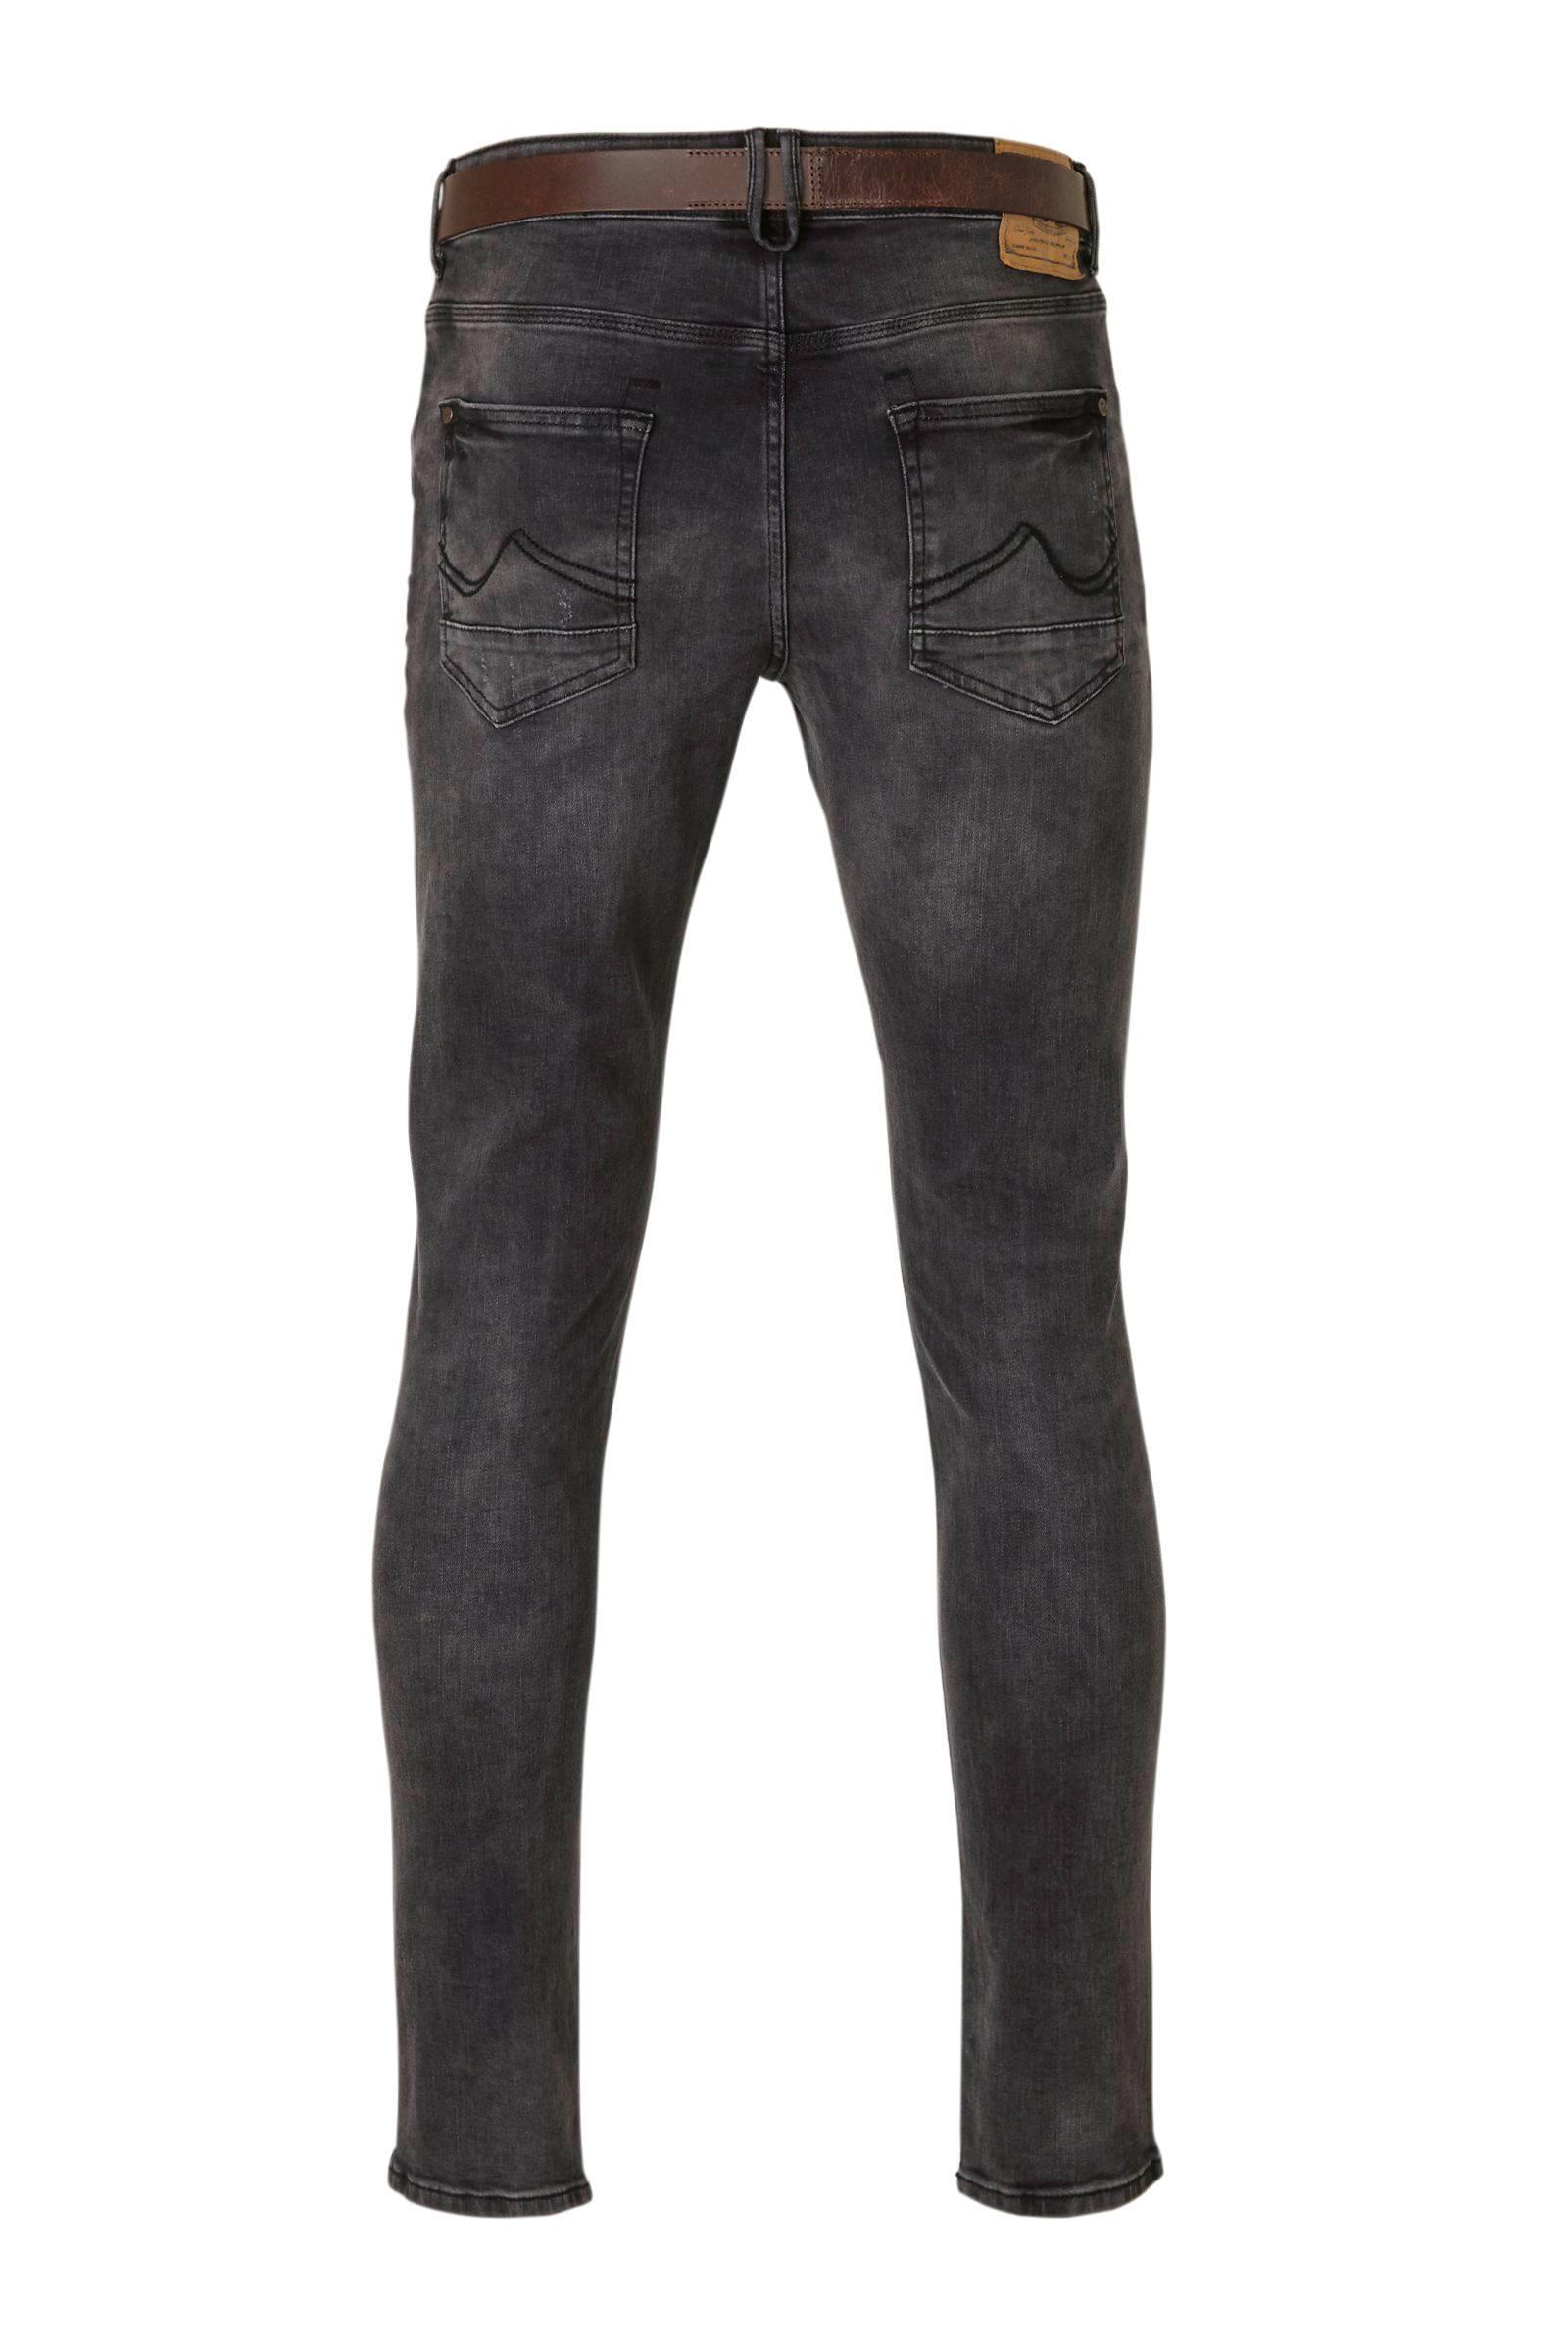 Petrol Industries slim fit jeans Seaham eight ball | wehkamp